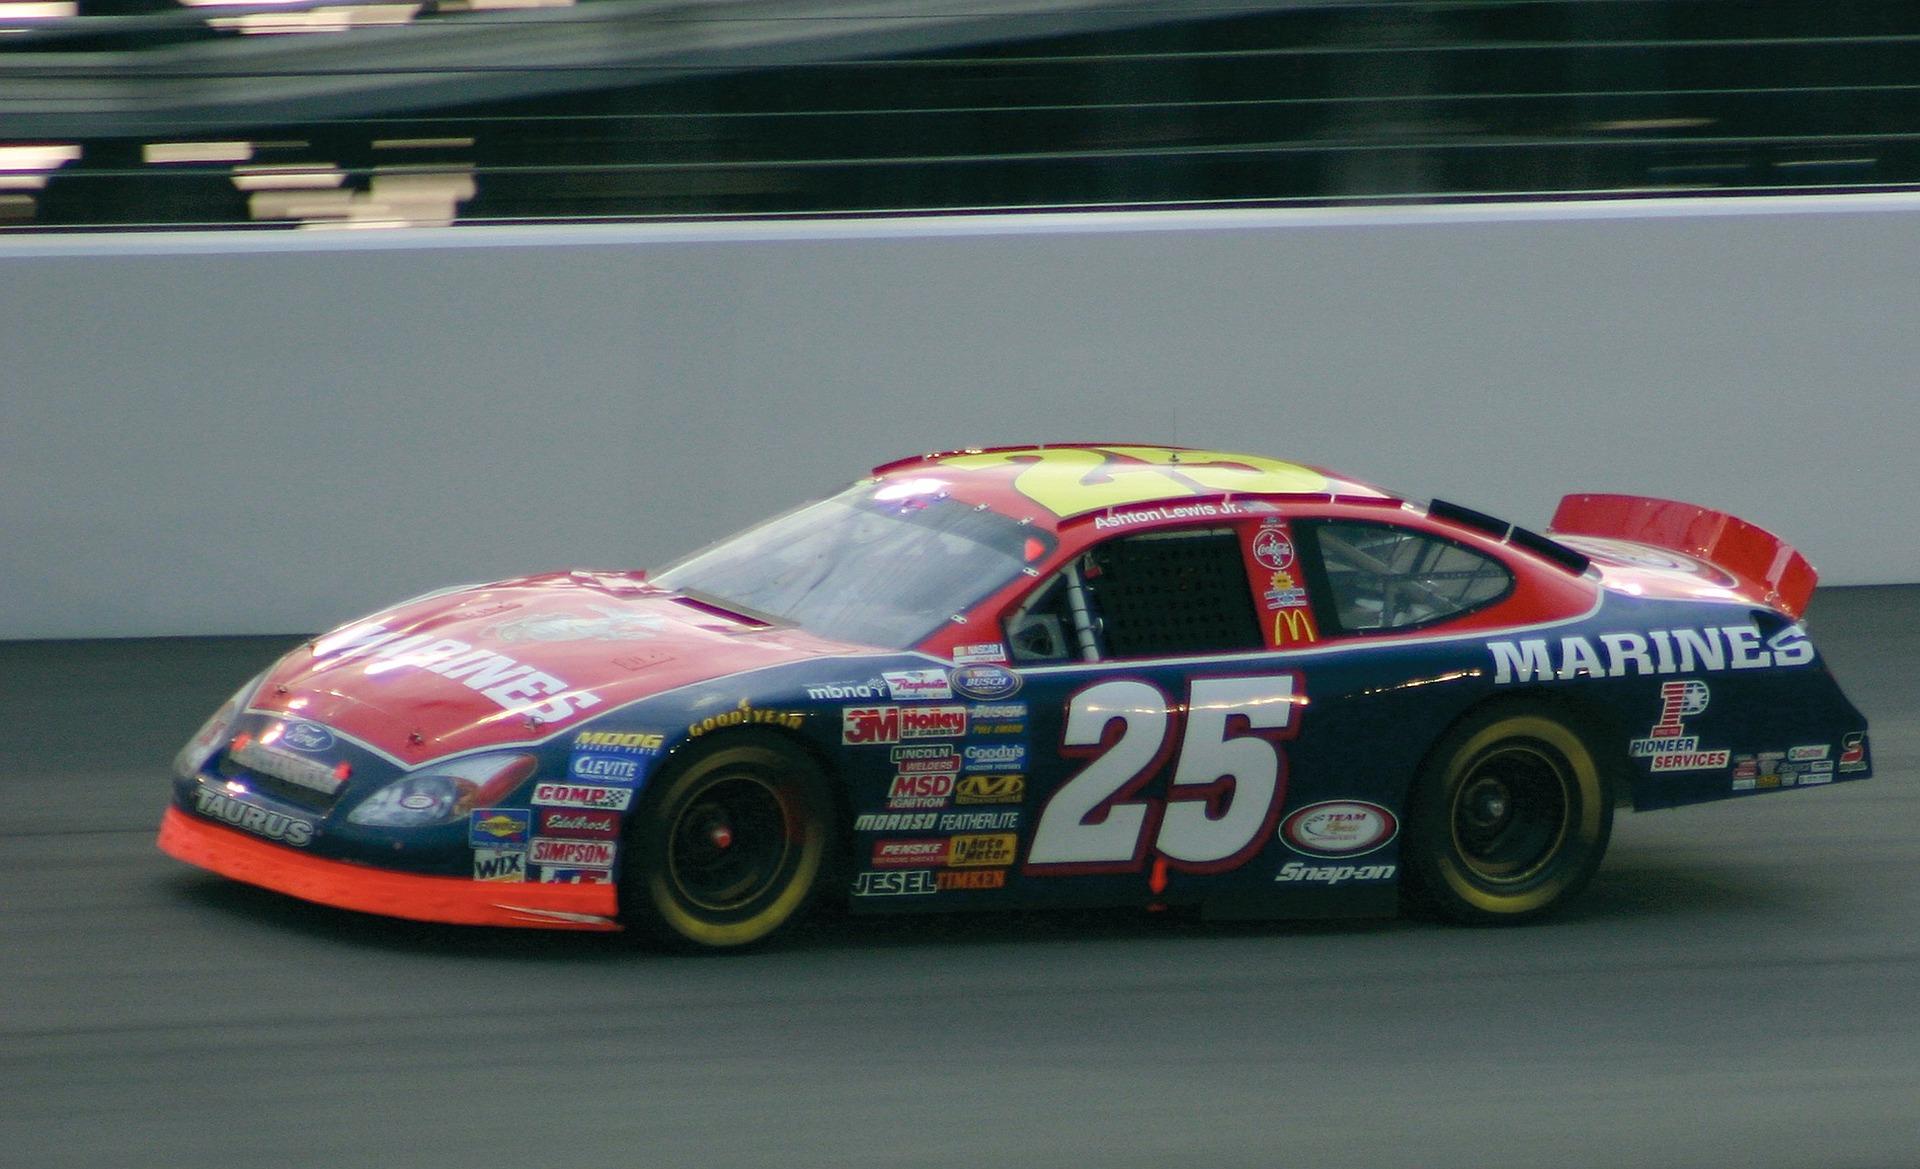 (8/16/20) NASCAR at The Glen